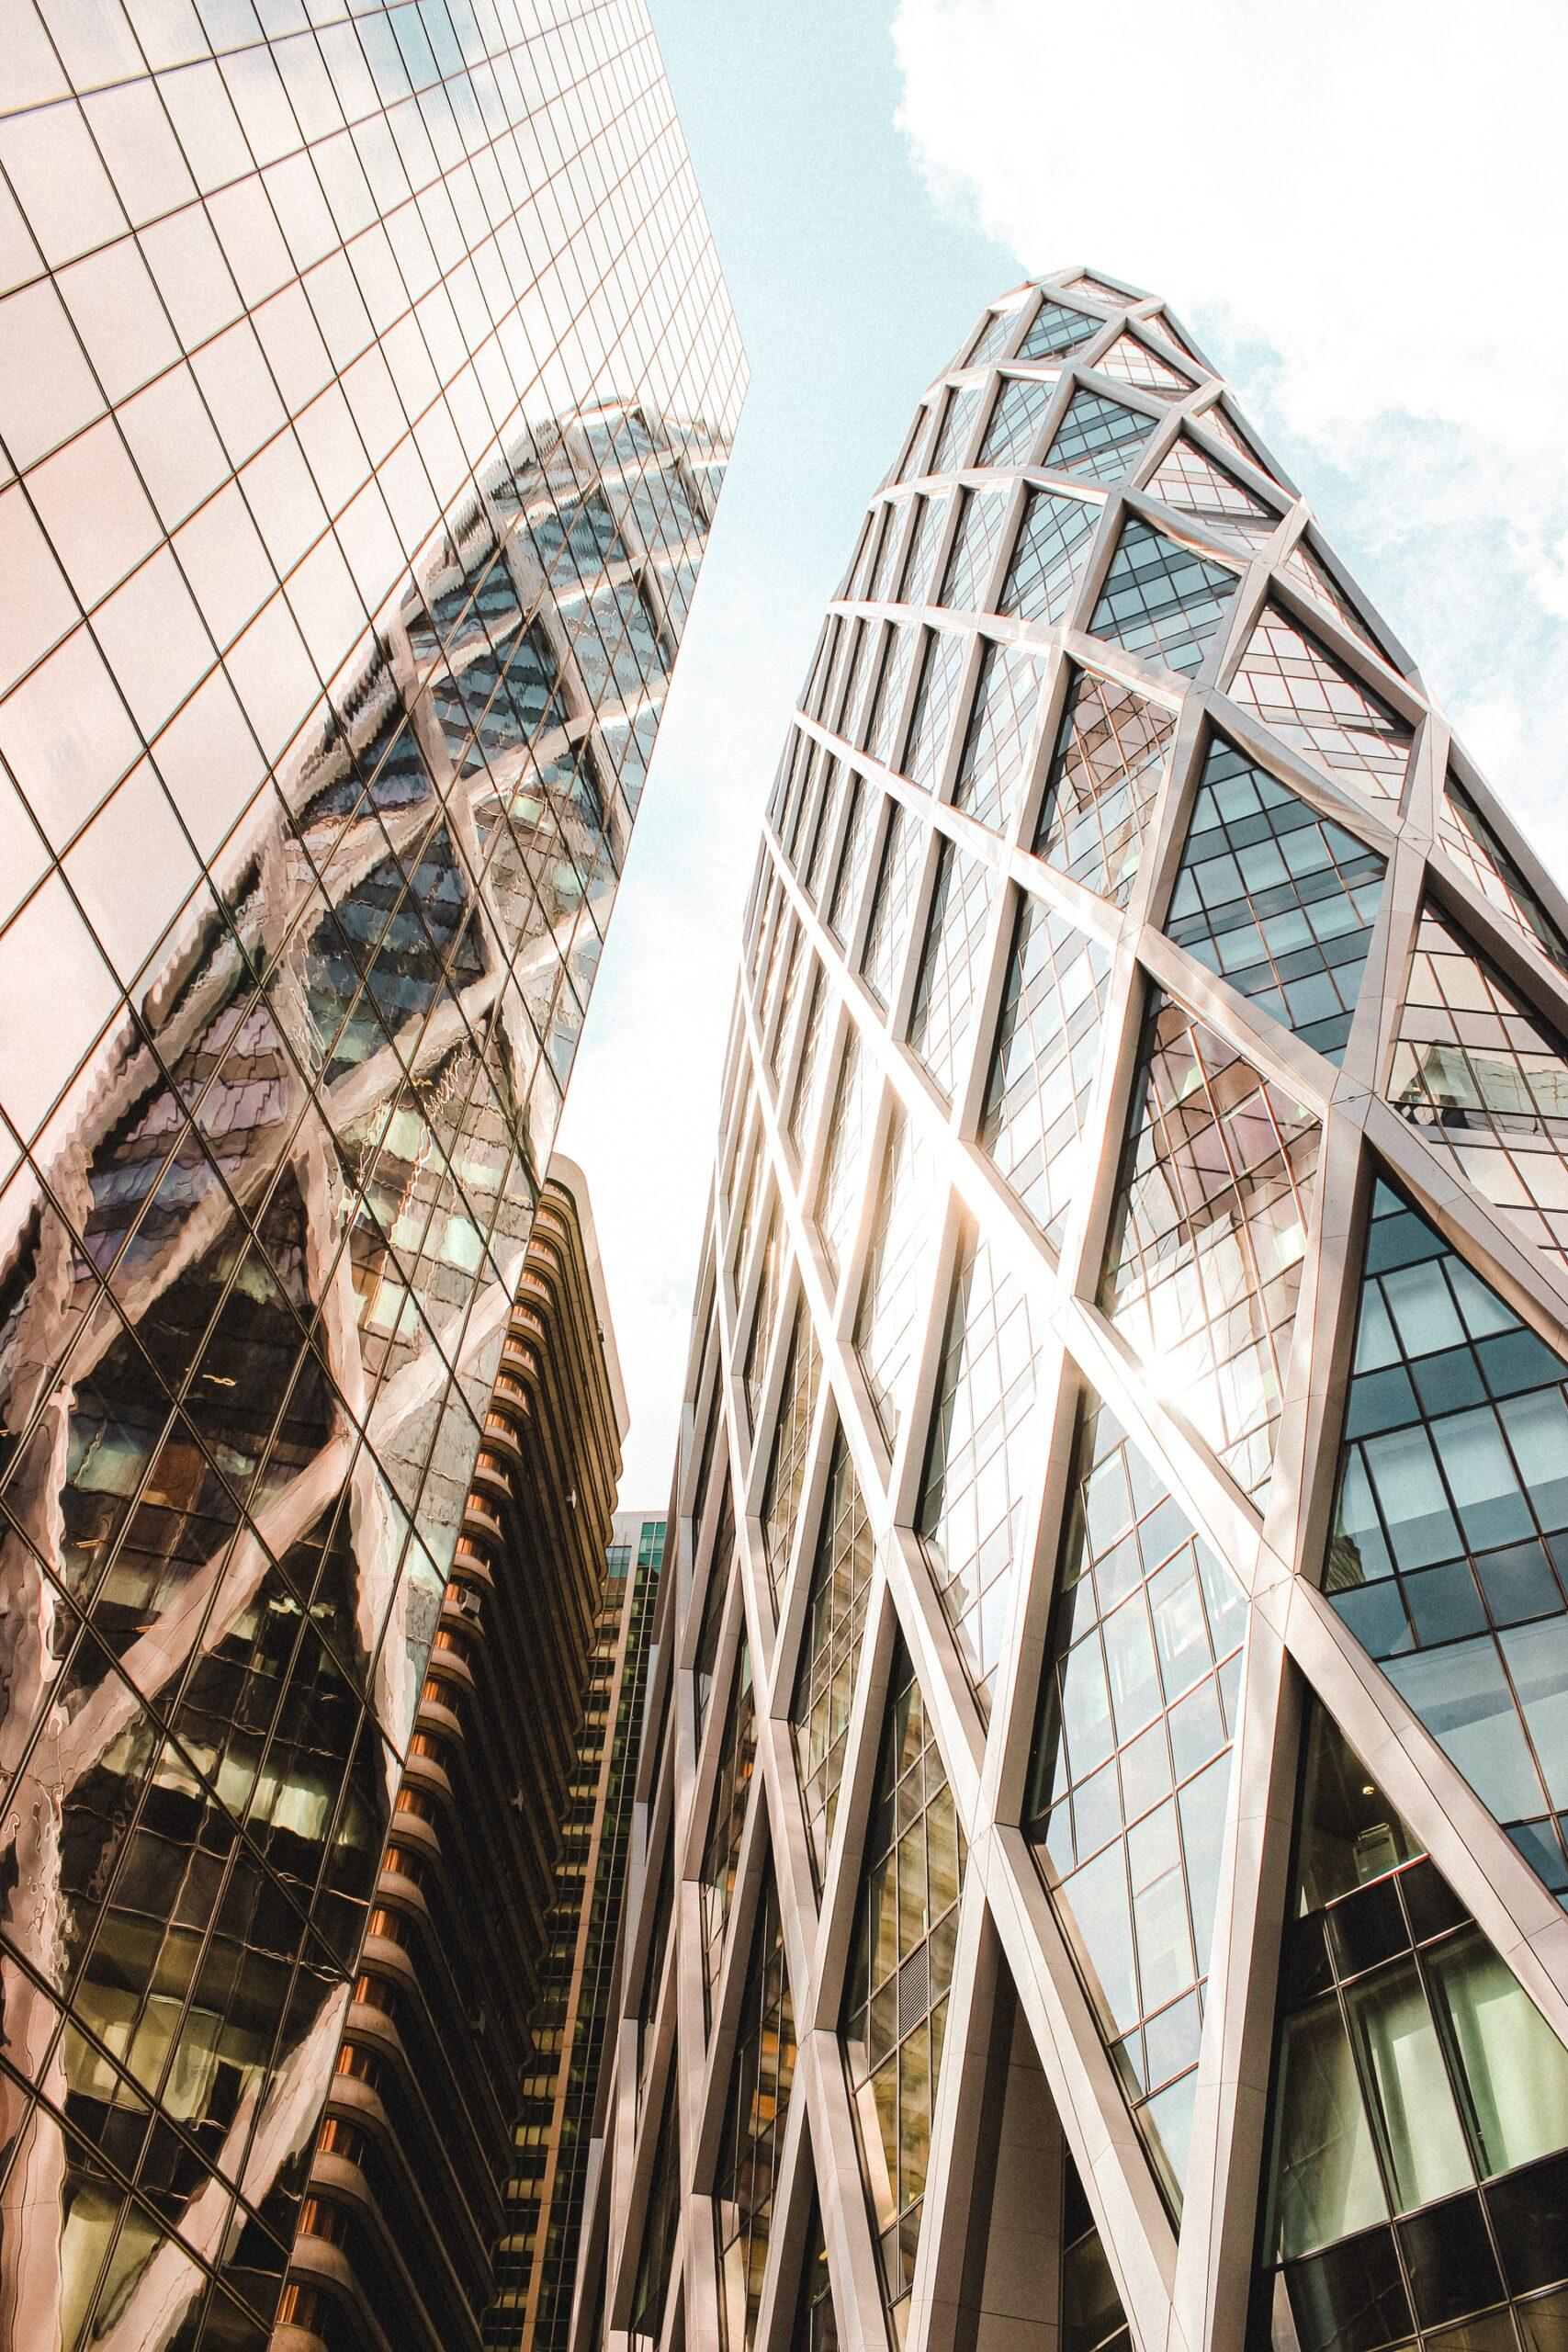 BGII democratizing the investment world